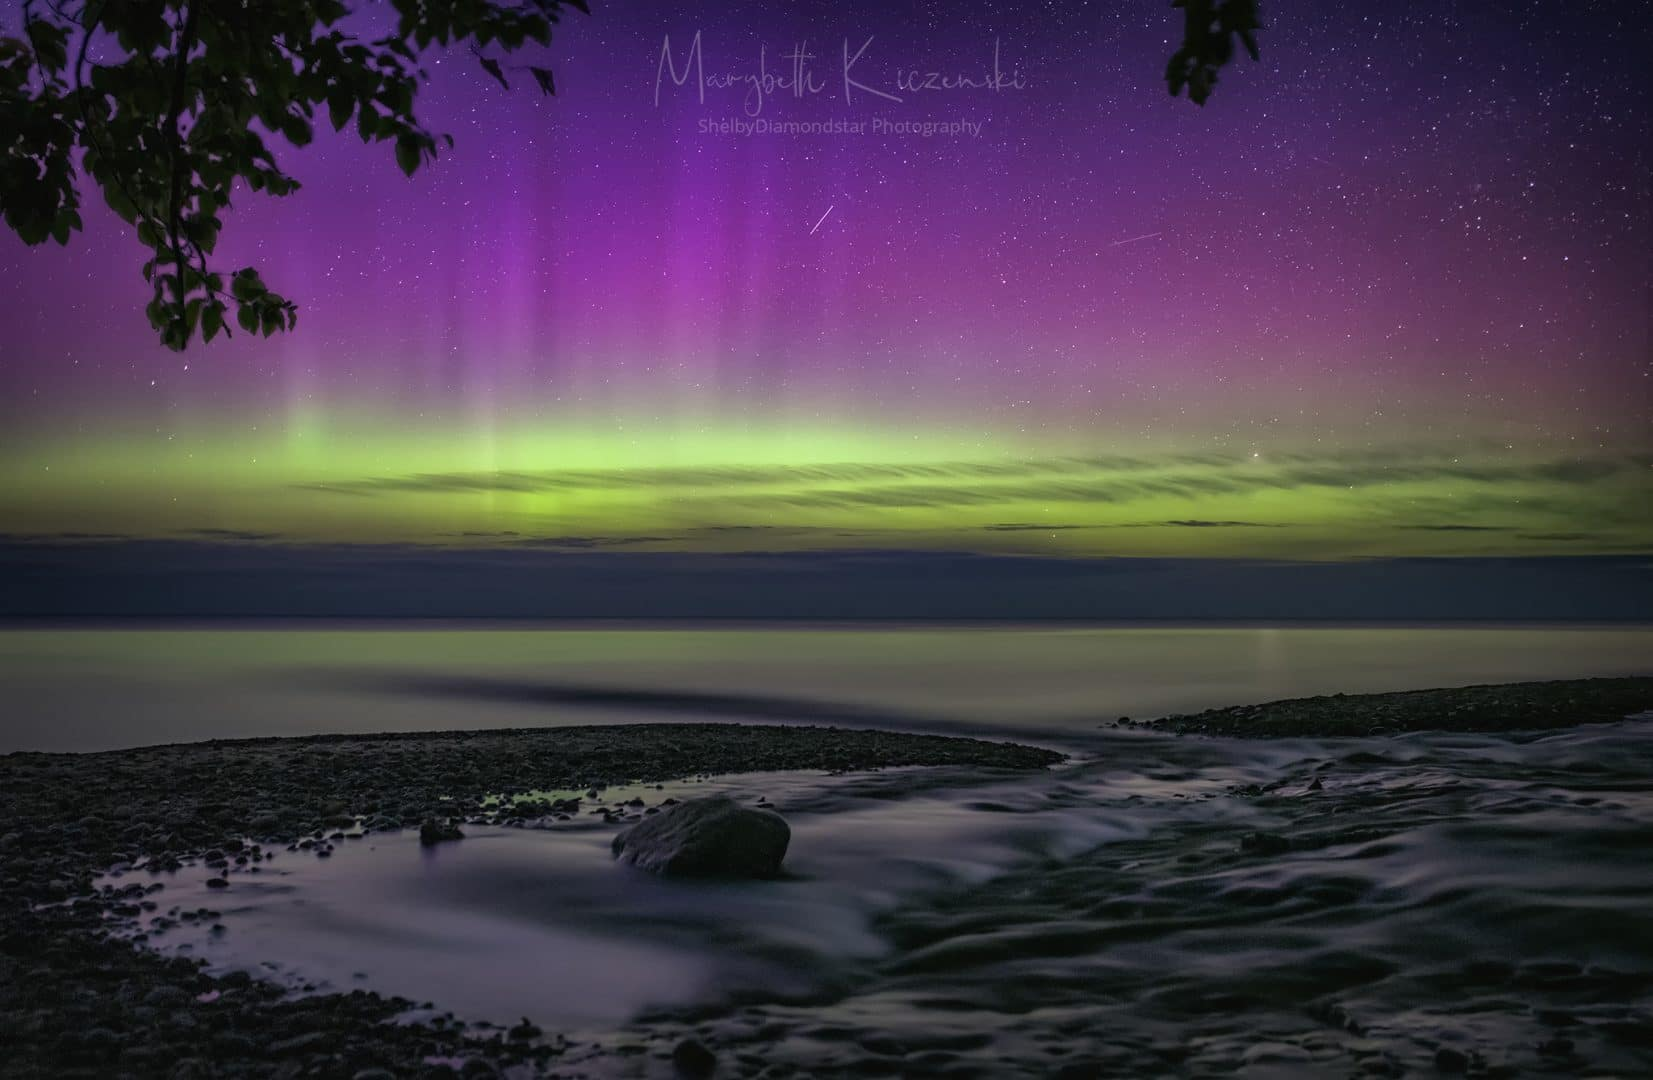 At the start of the night, Lady Aurora danced in pillars. (Sigma ART 35mm - Nikon D850) Photo by MaryBeth Kiczenski.